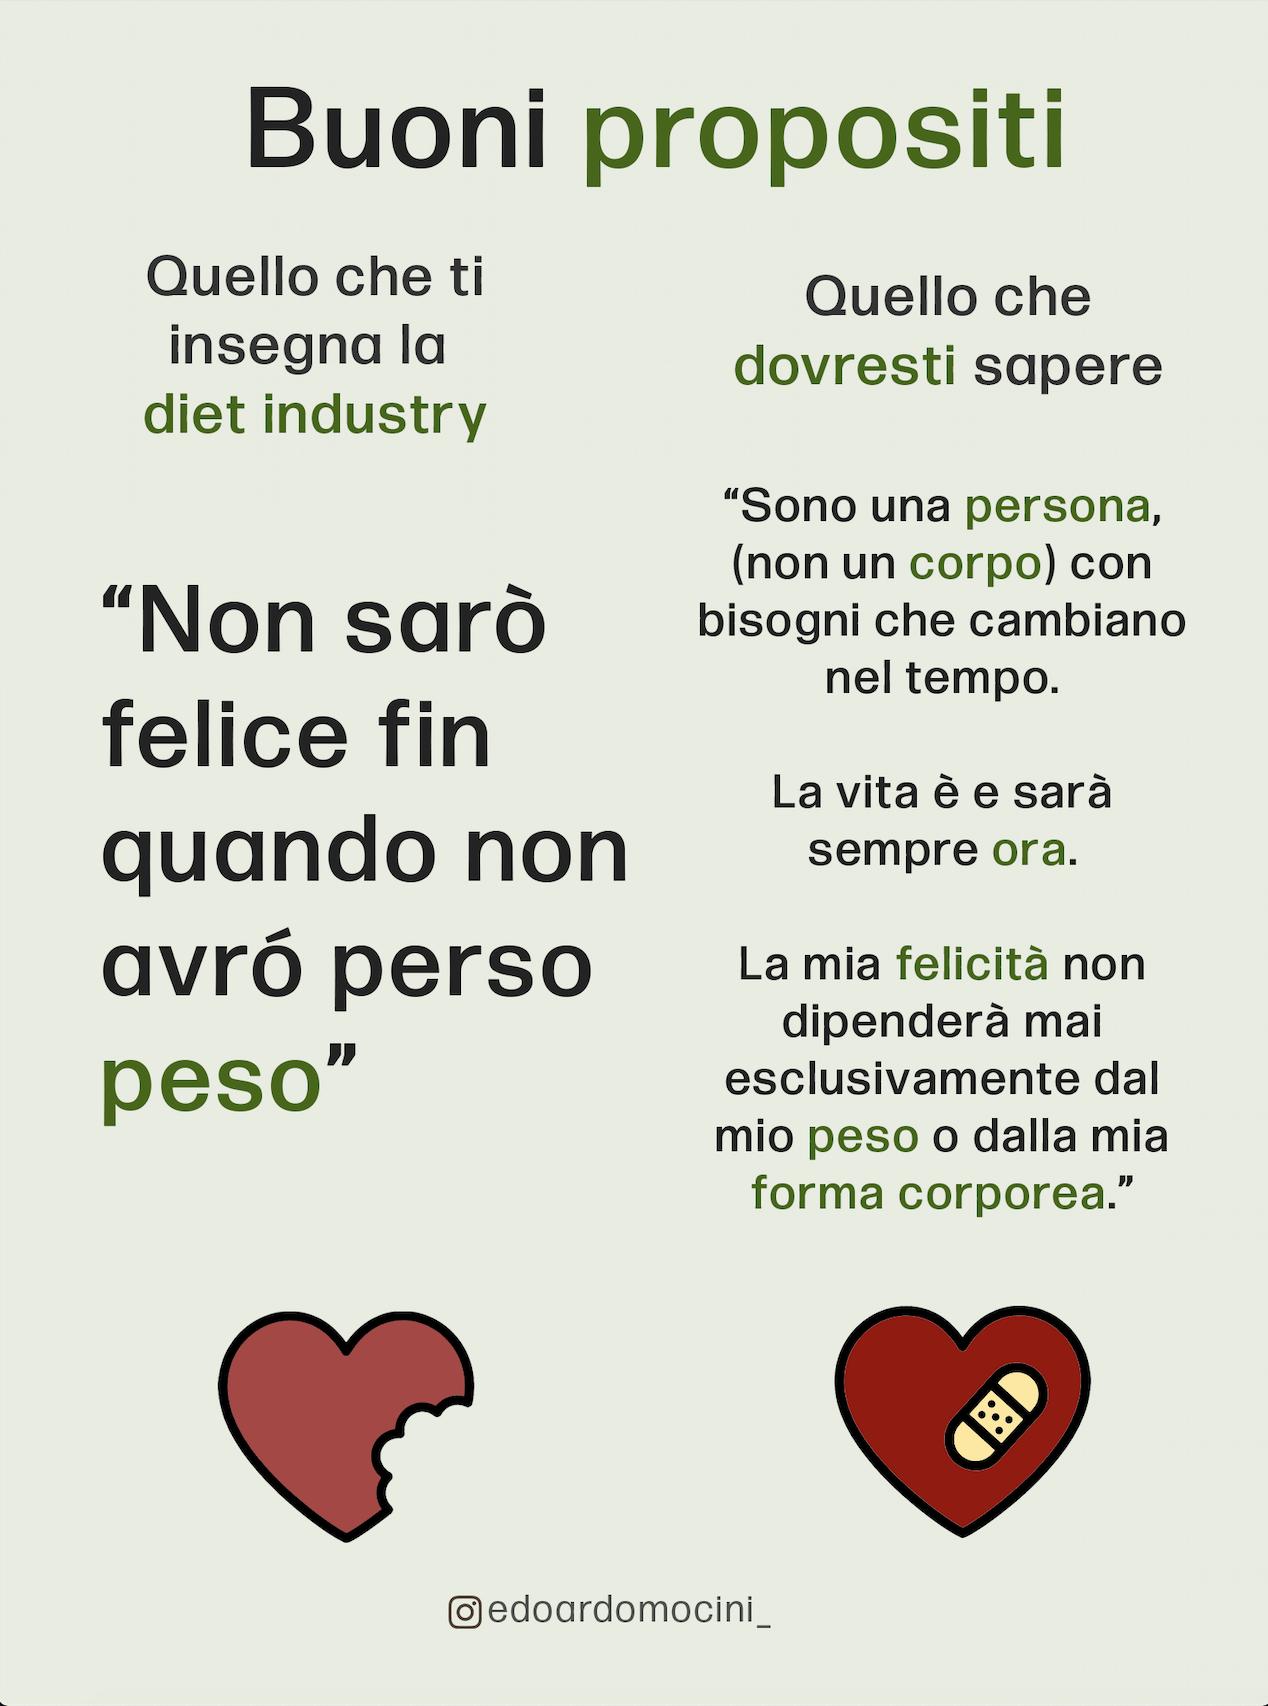 diet culture Mocini